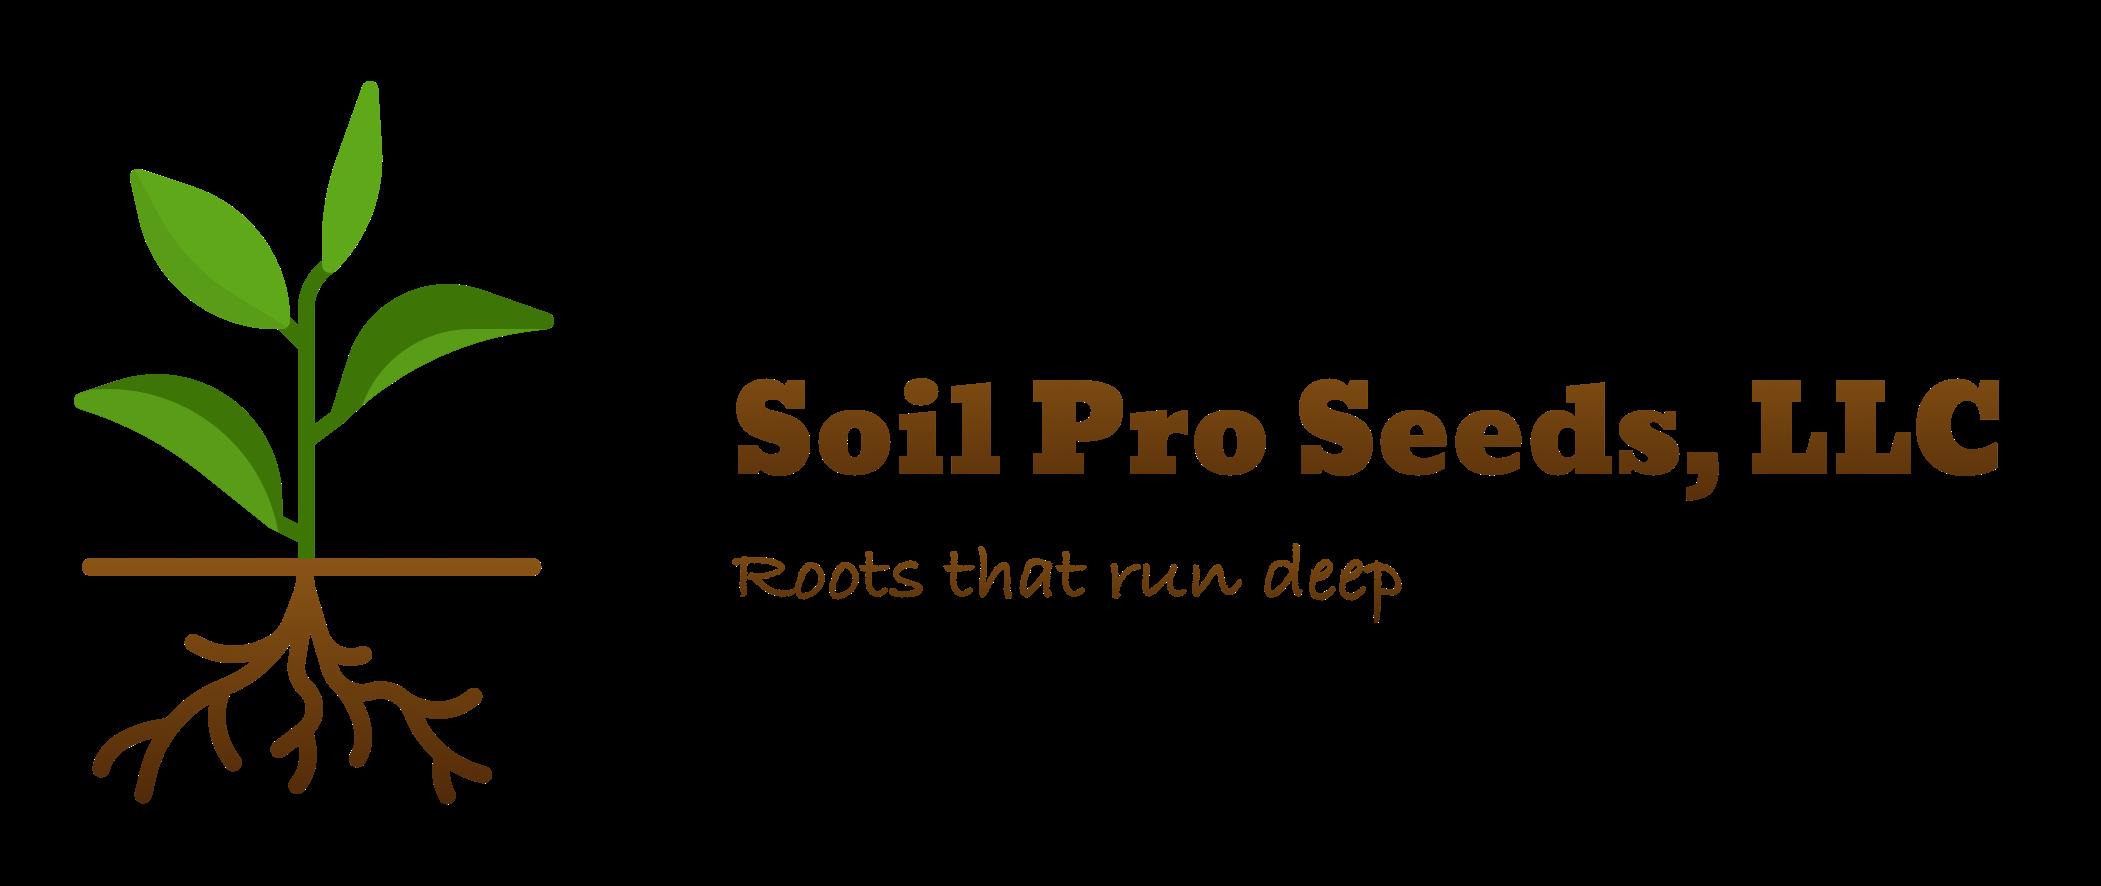 Soil Pro Seeds